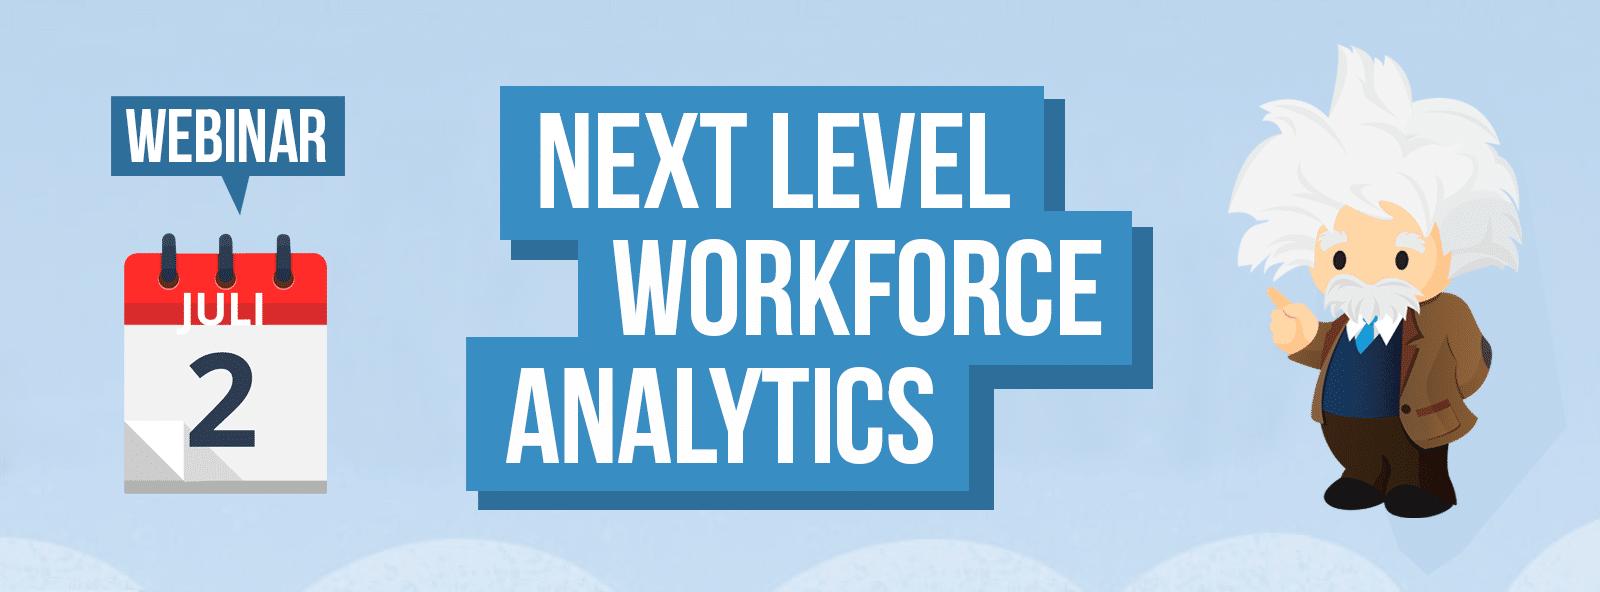 Nétive VMS Webinar Next Level Workforce Analytics